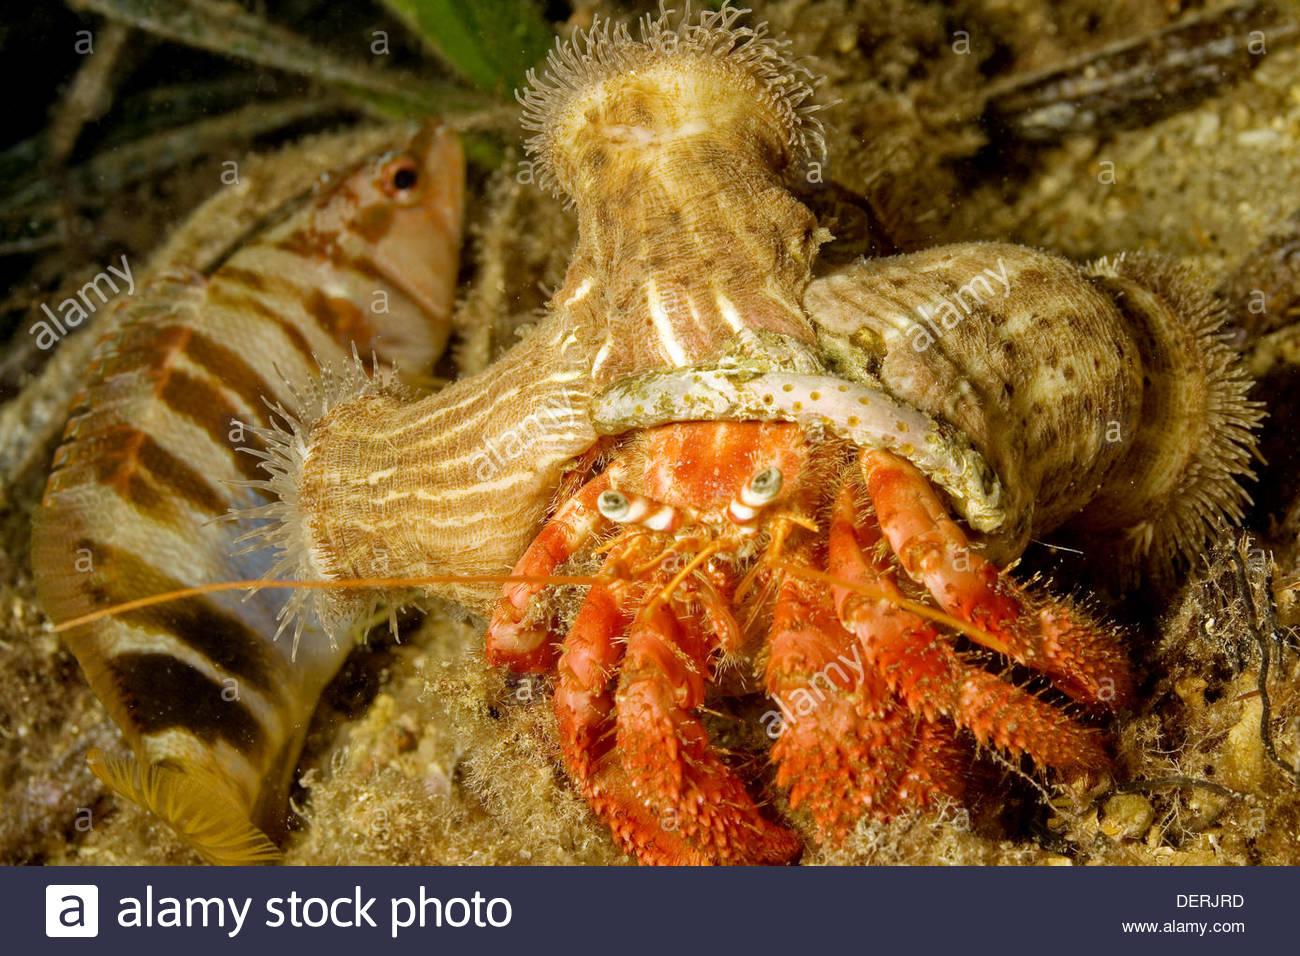 gran ermitao great hermitcrab dardanus parasitica mar mediterrneo